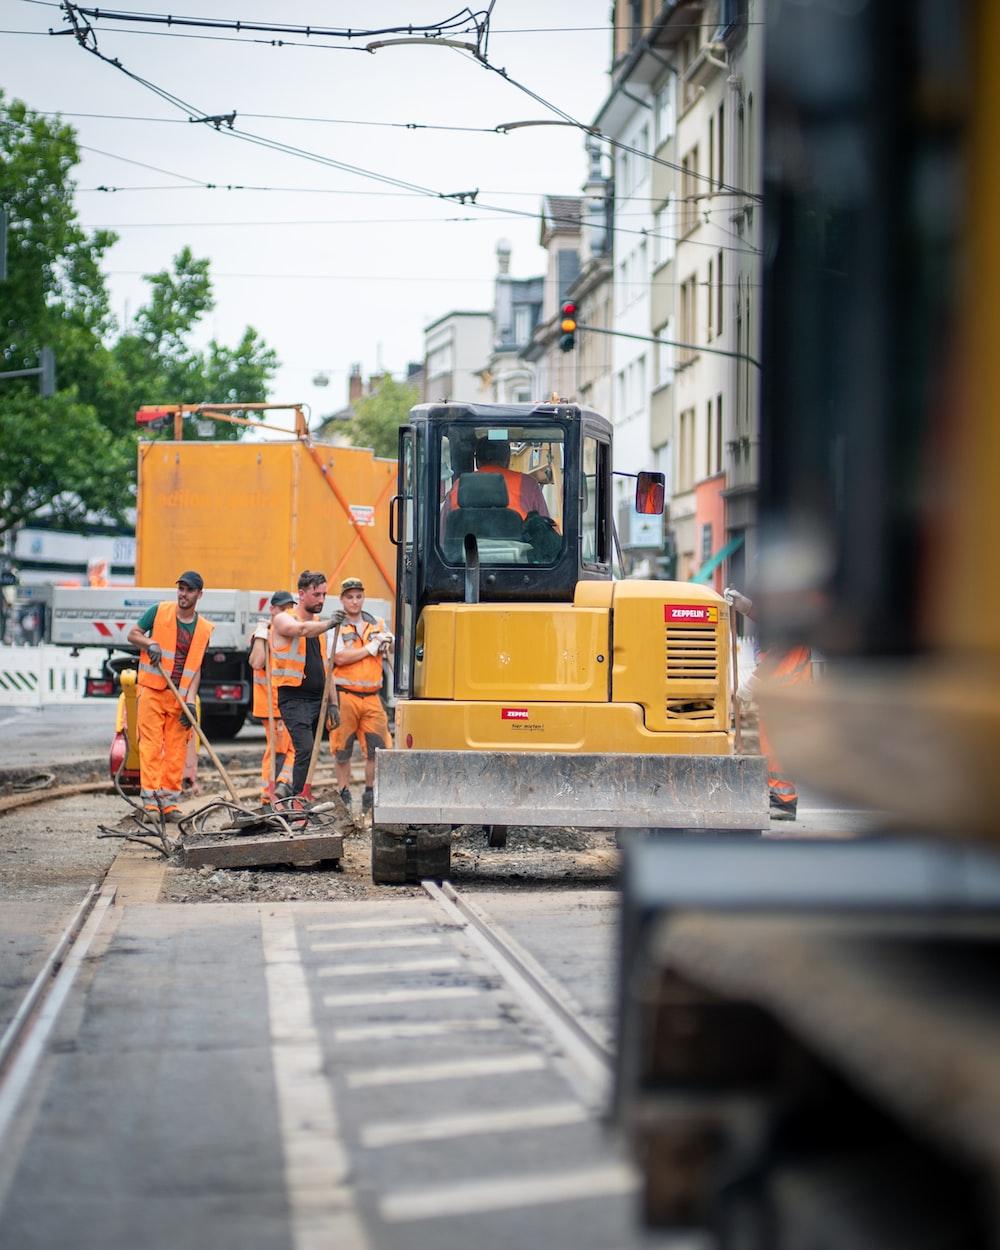 man in orange jacket standing beside yellow truck during daytime